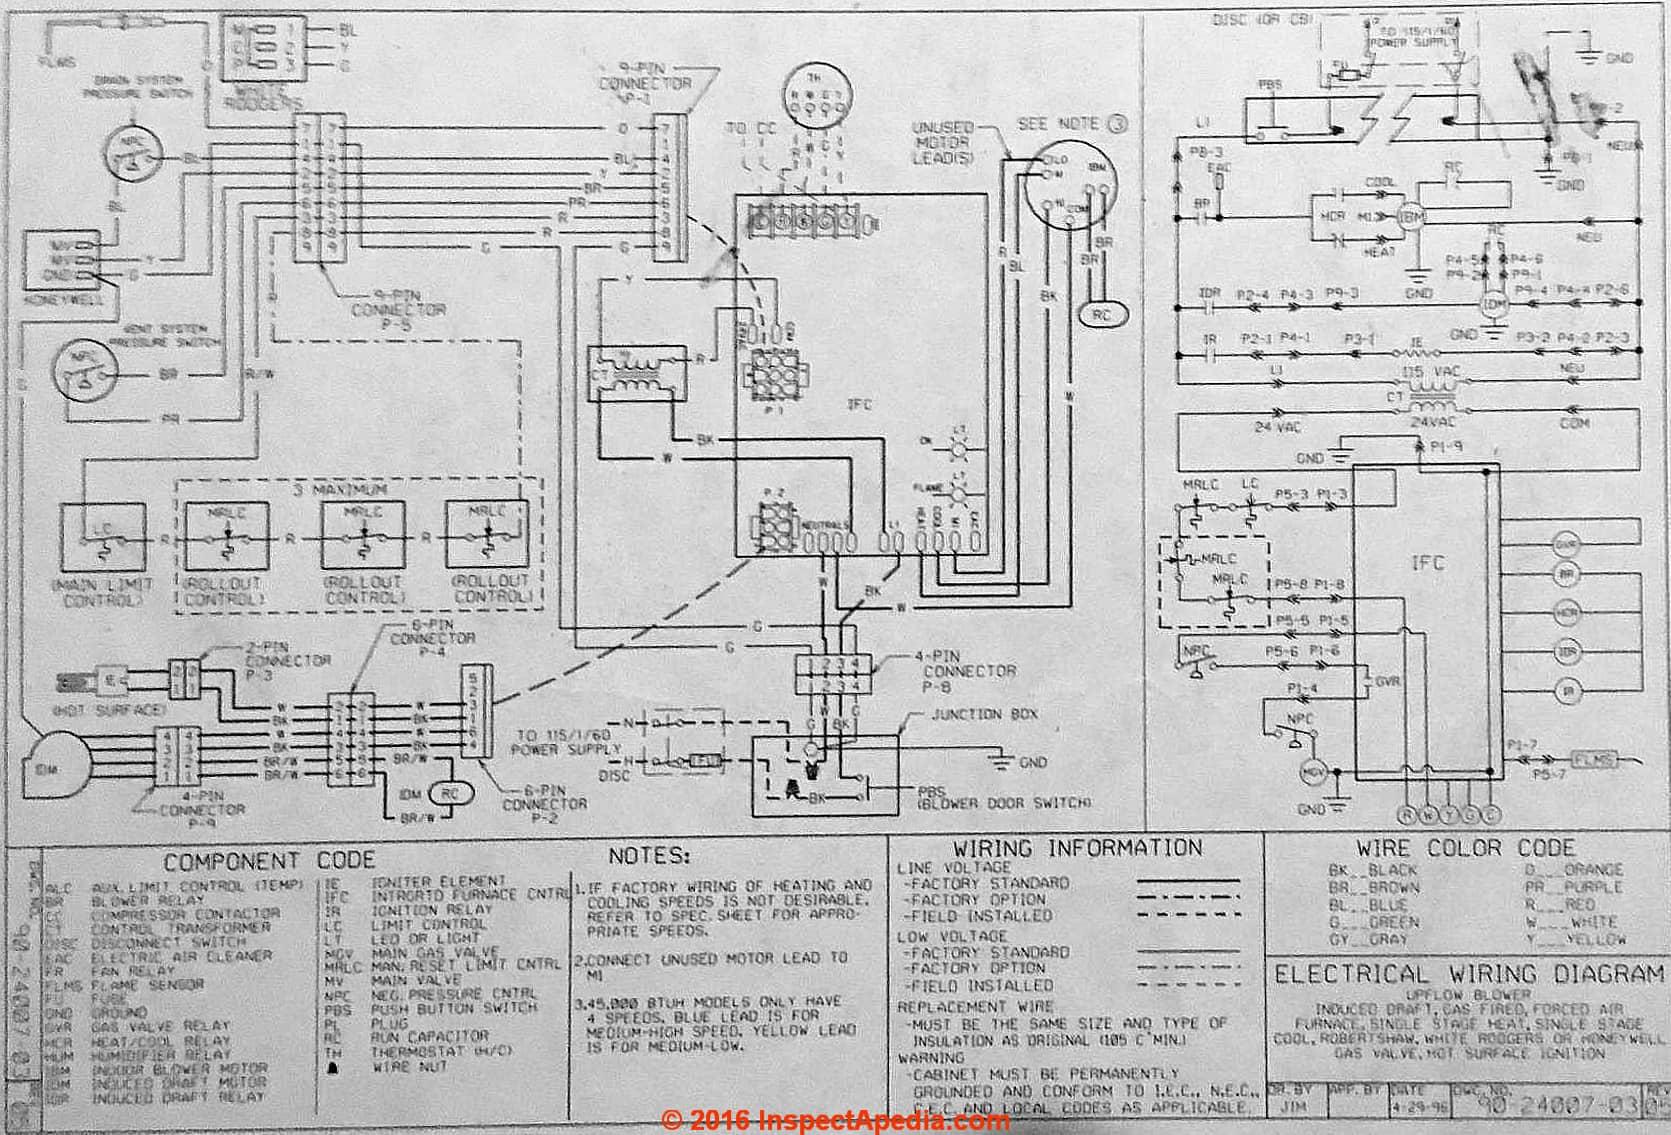 Rheem heat pump thermostat wiring diagram facbooik com rheem heat pump thermostat wiring diagram facbooik, Compressor Wiring Diagram